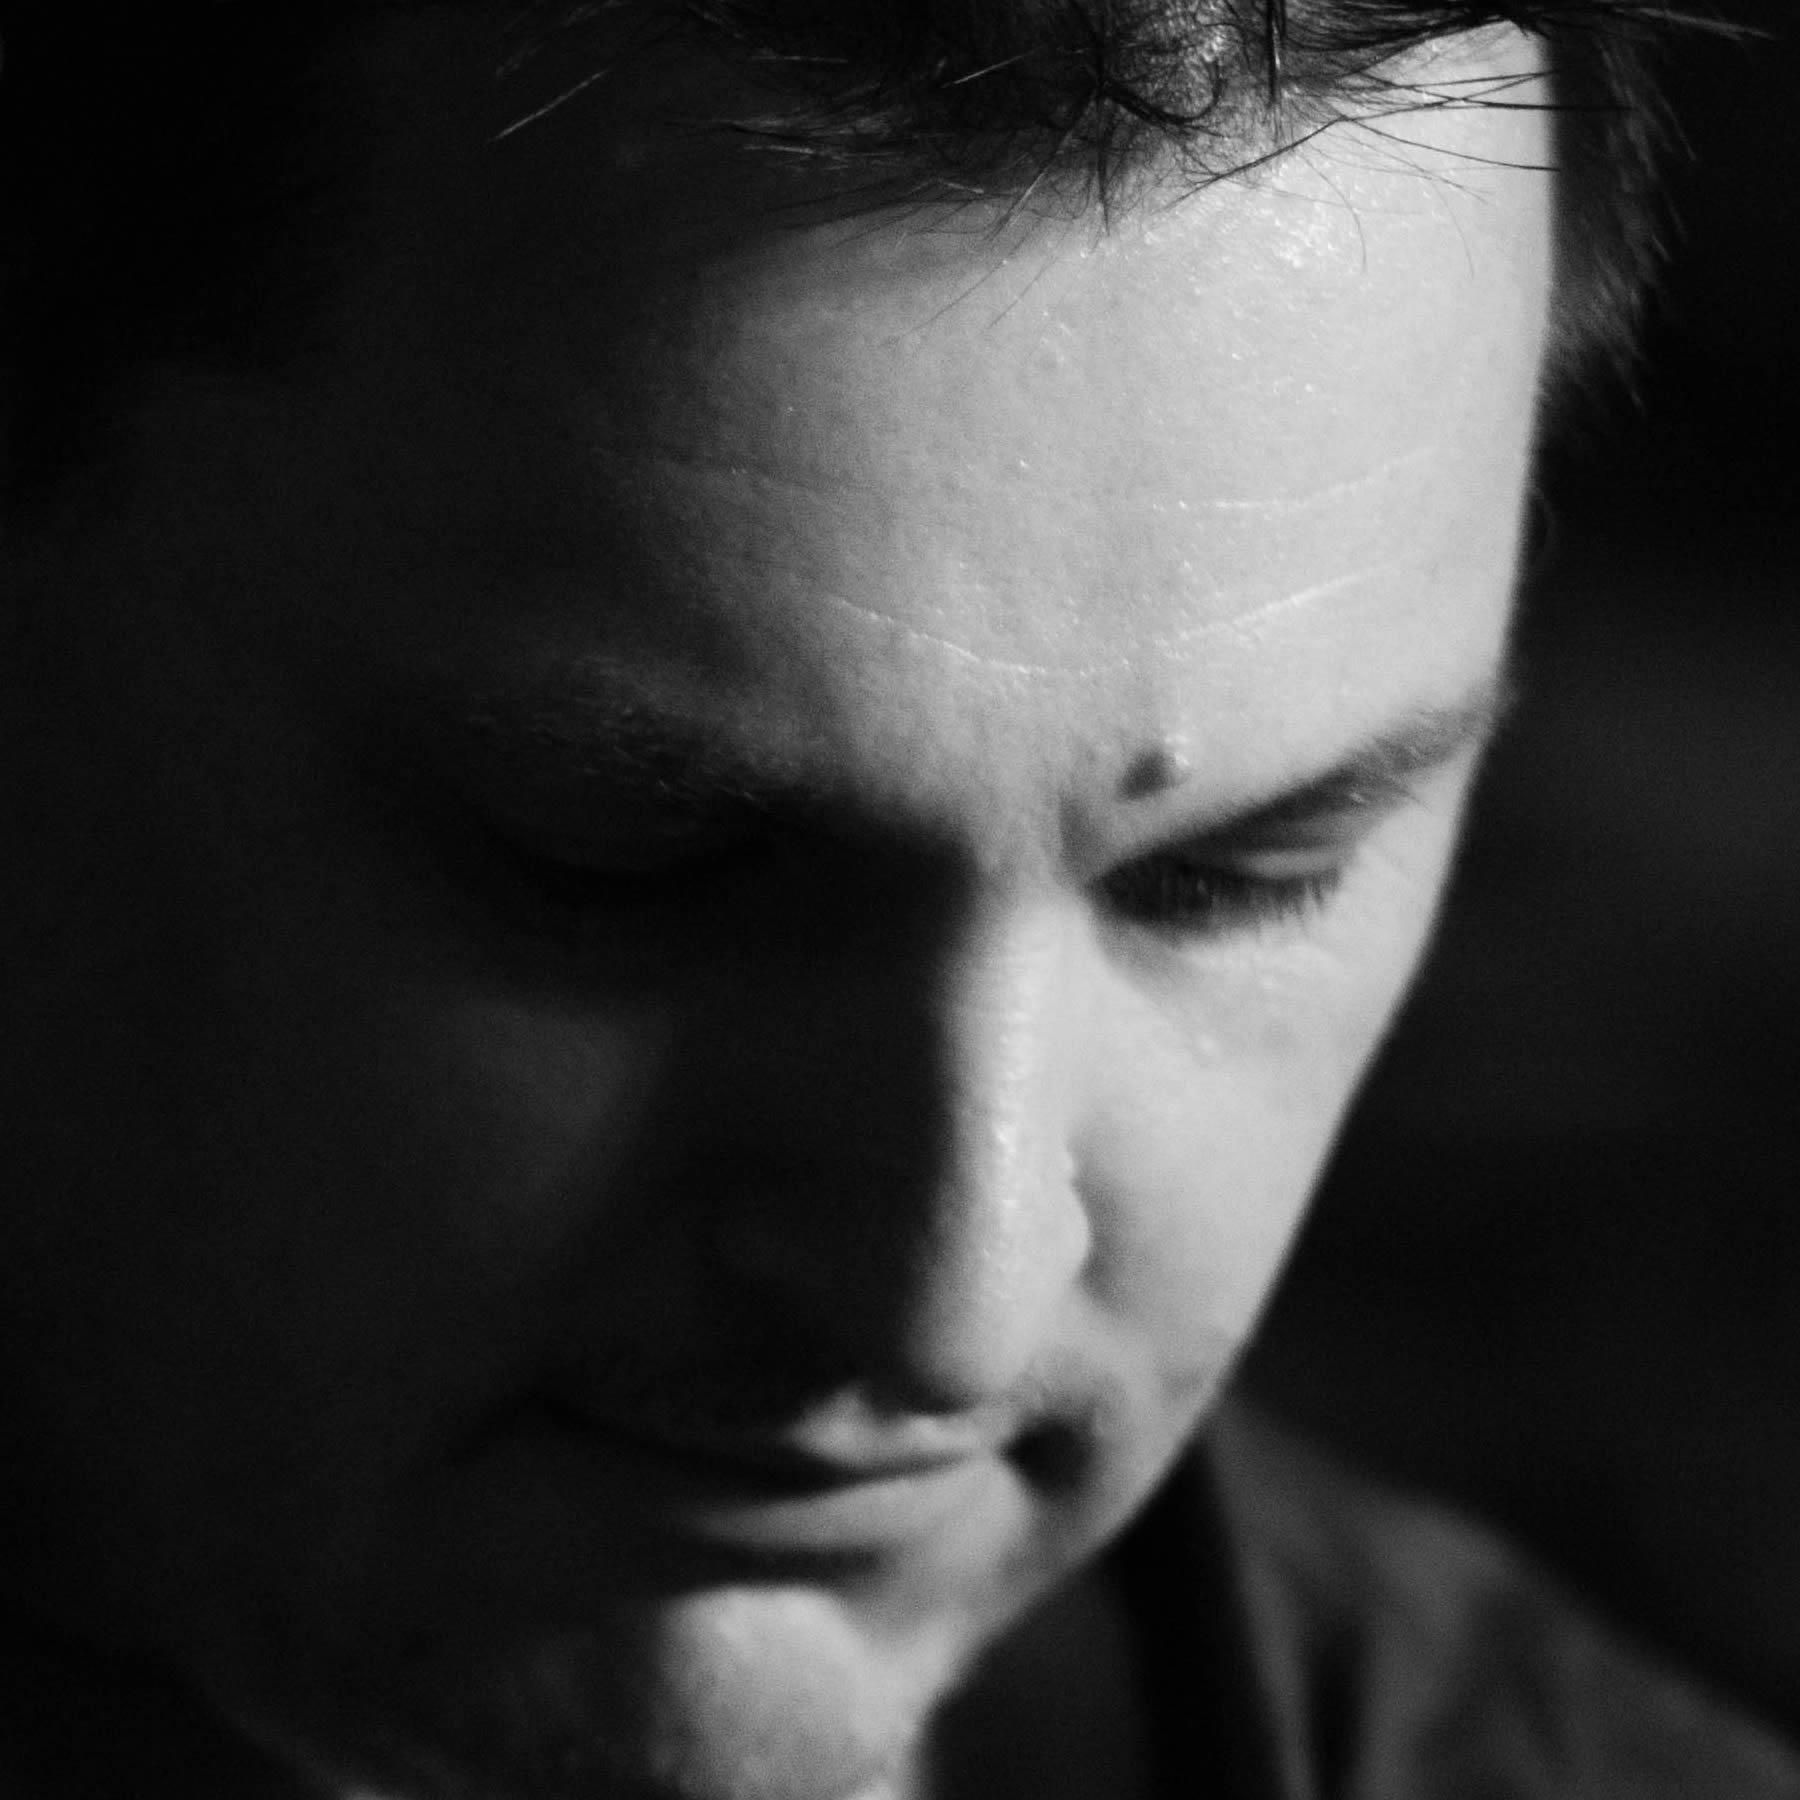 Christopher Richter